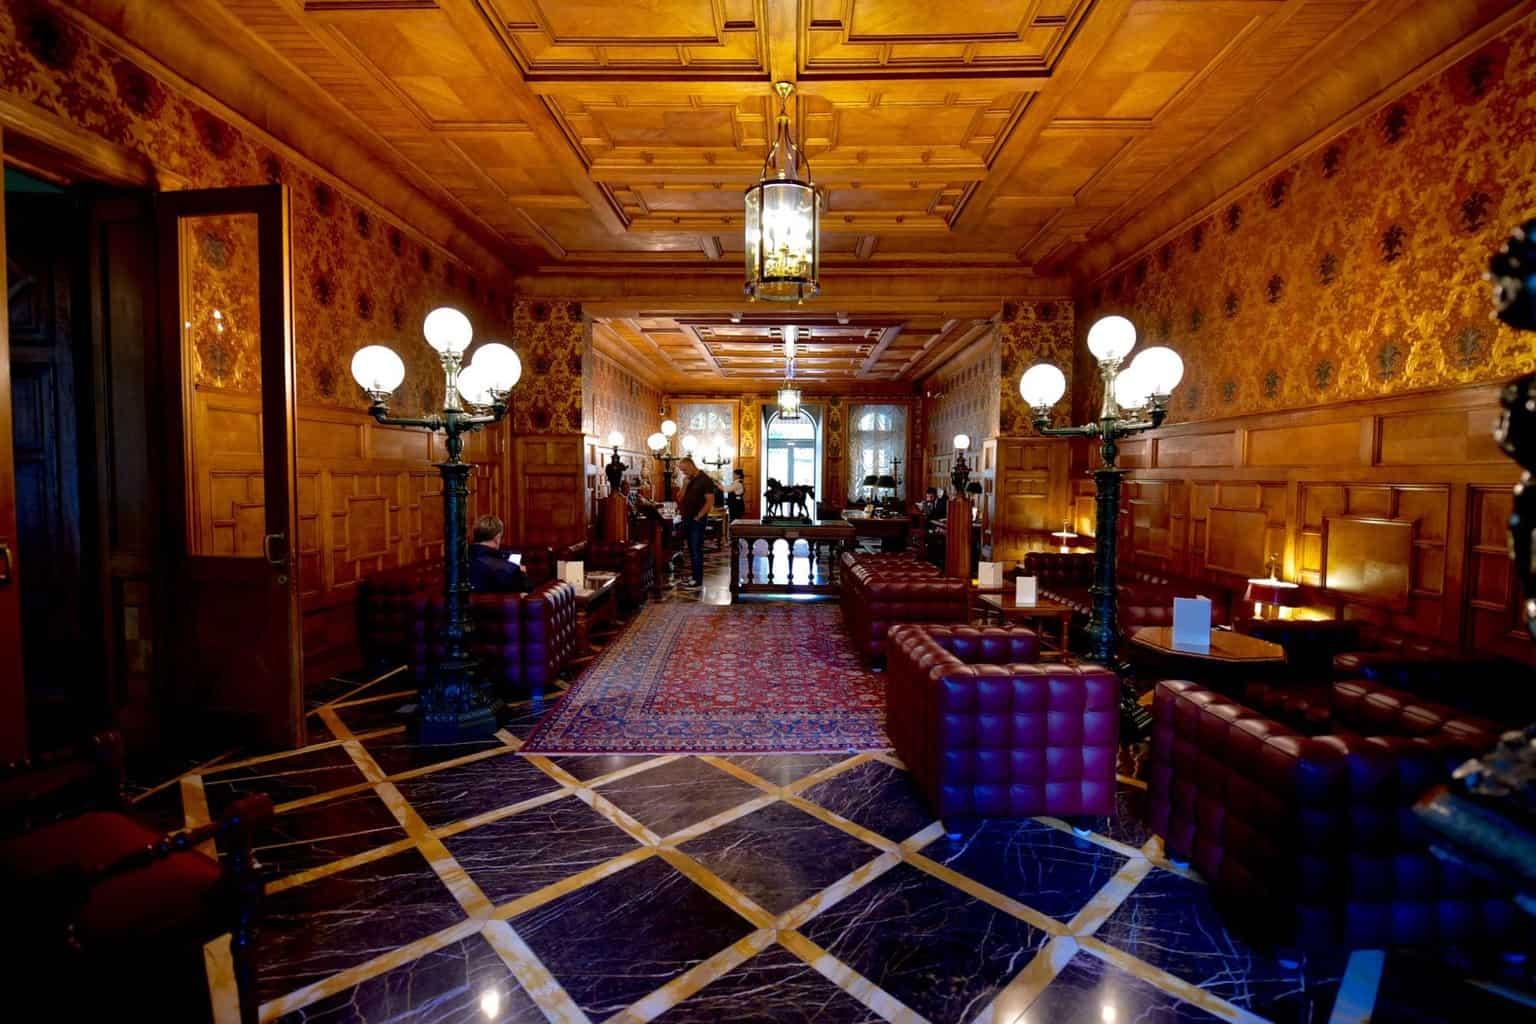 Gallery Park Hotel. Riga Latvia